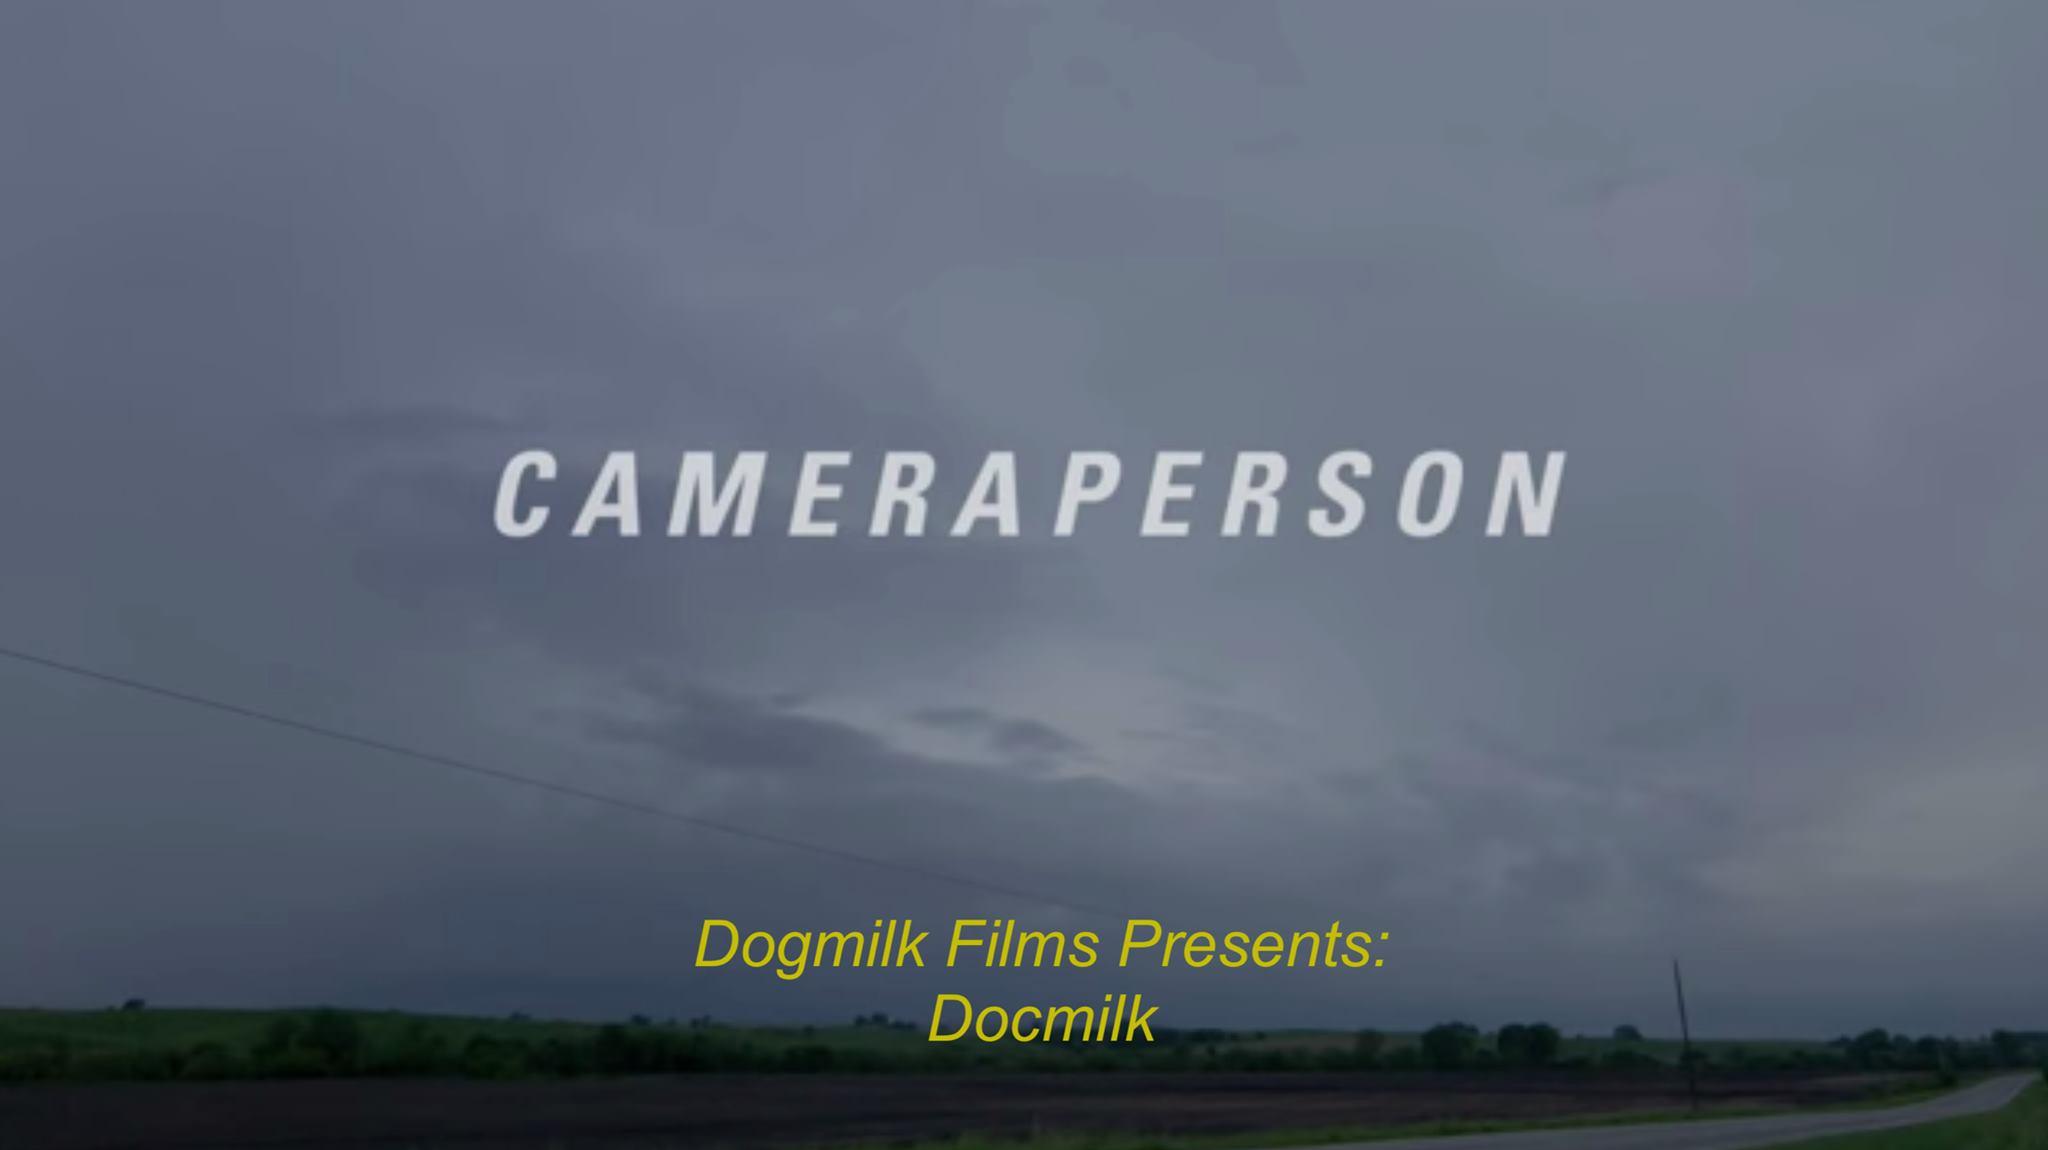 Dogmilk Films presents: Docmilk #1